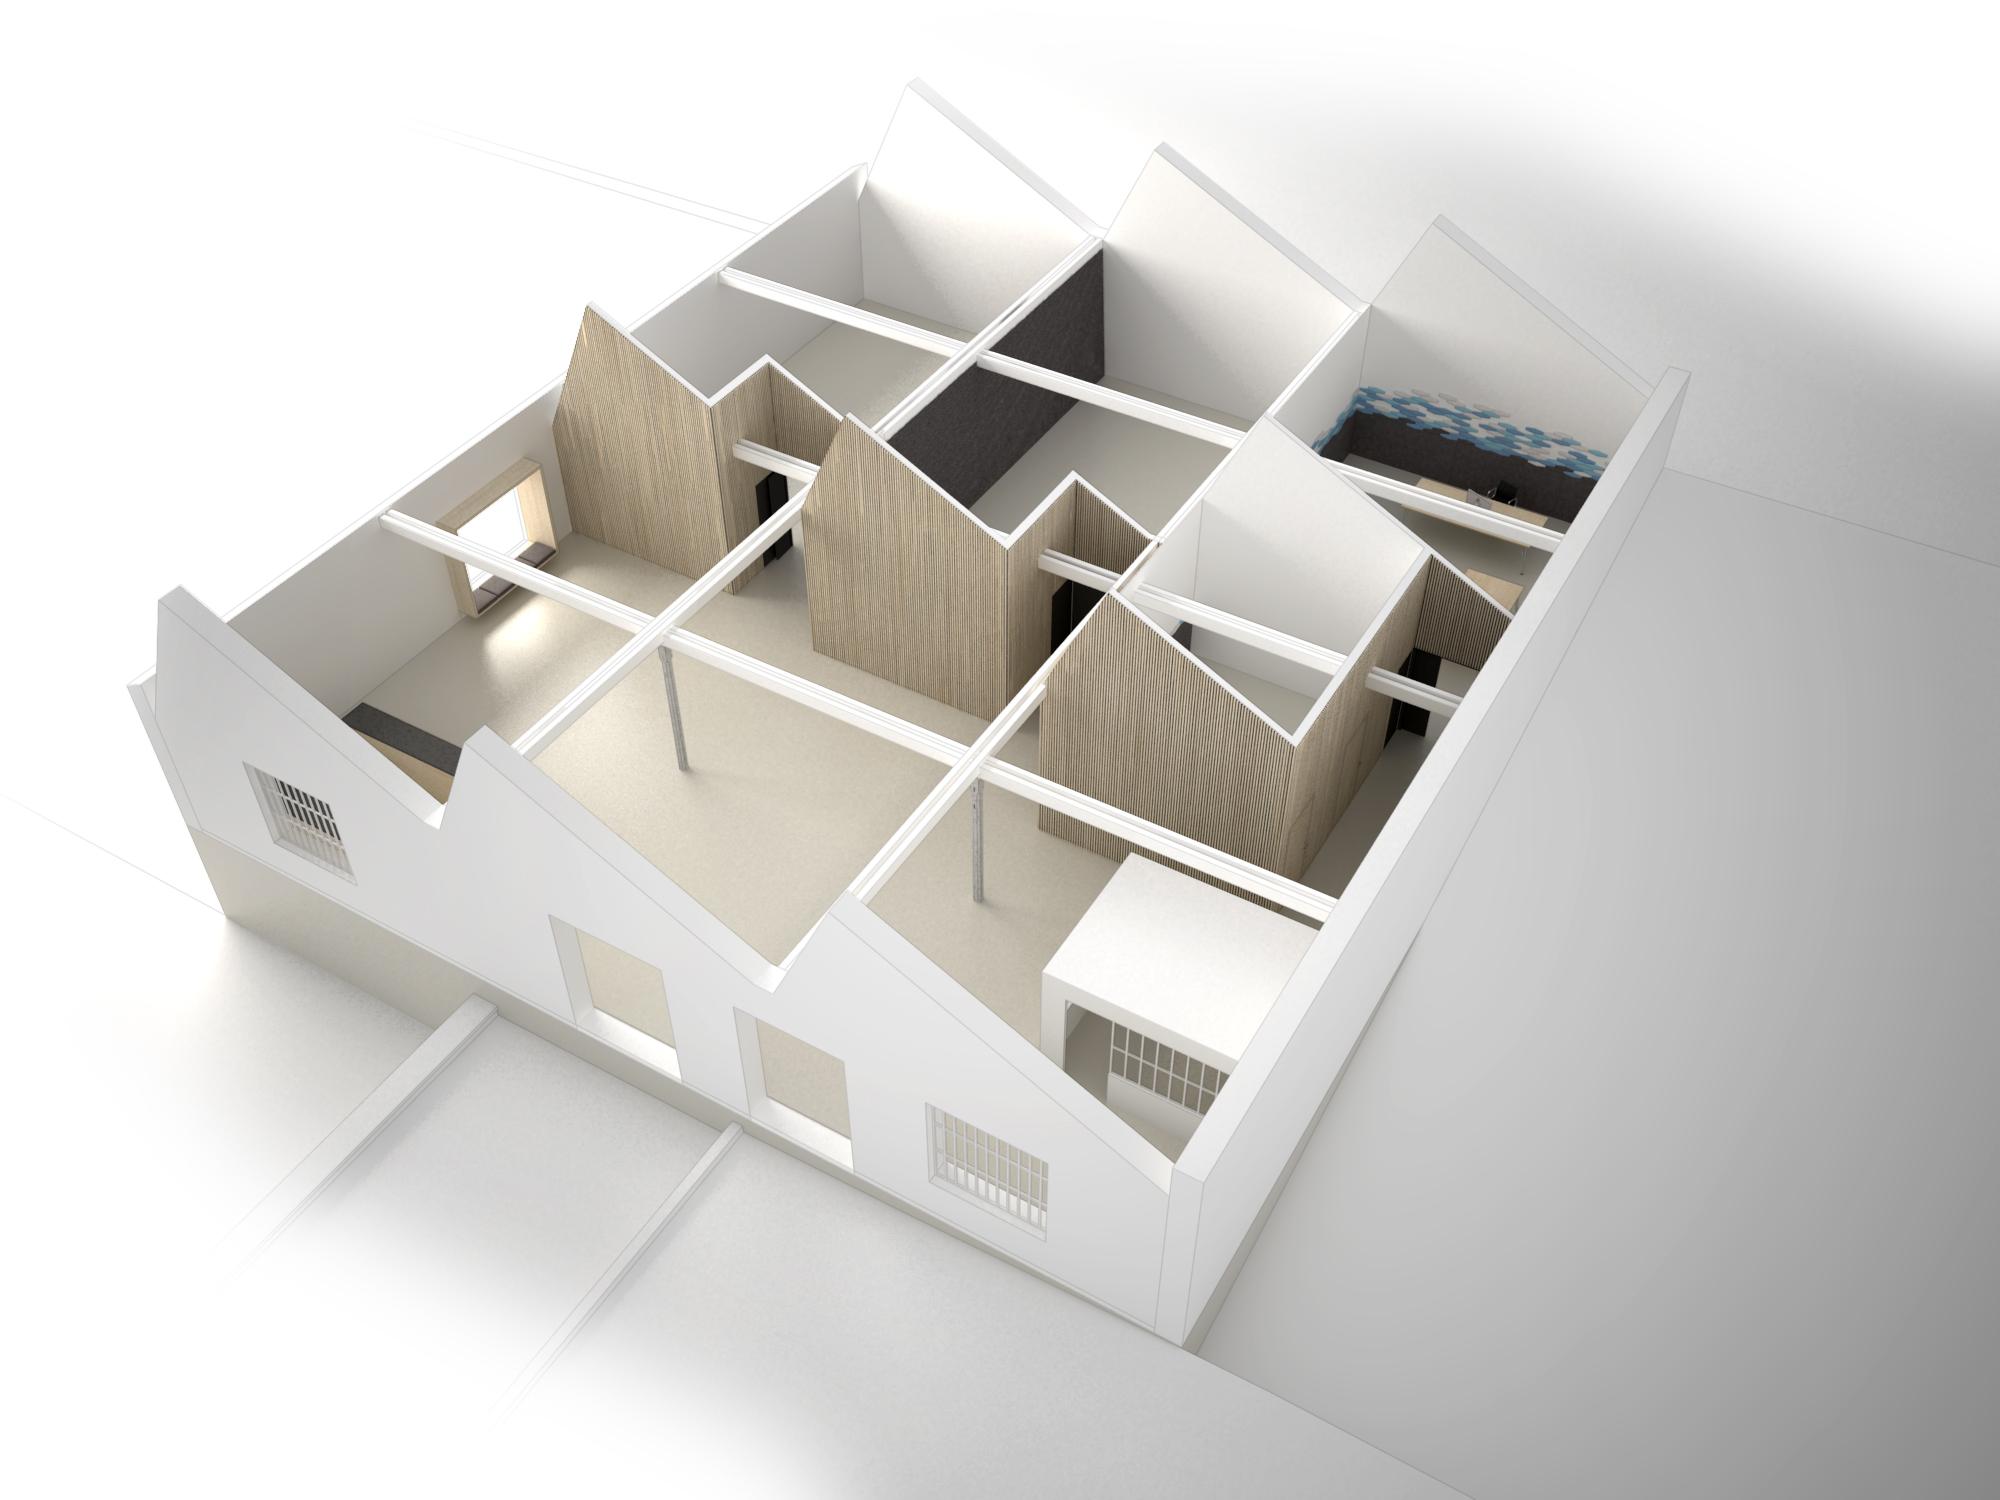 plan-renovation-usine